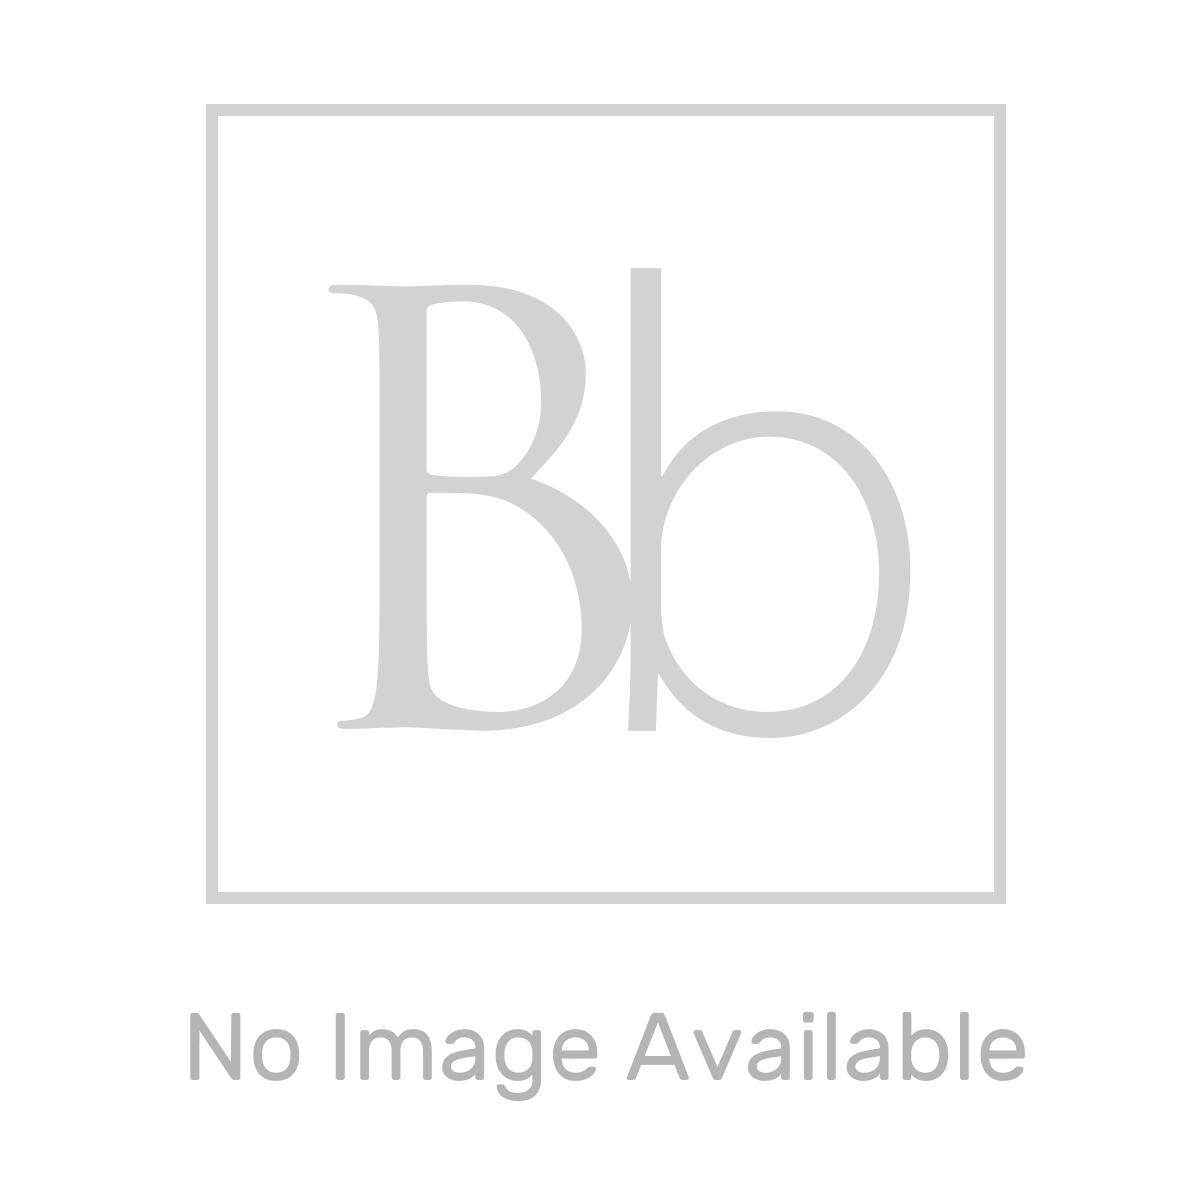 RAK Compact Bathroom Suite with Pacific Walk-In Shower Enclosure